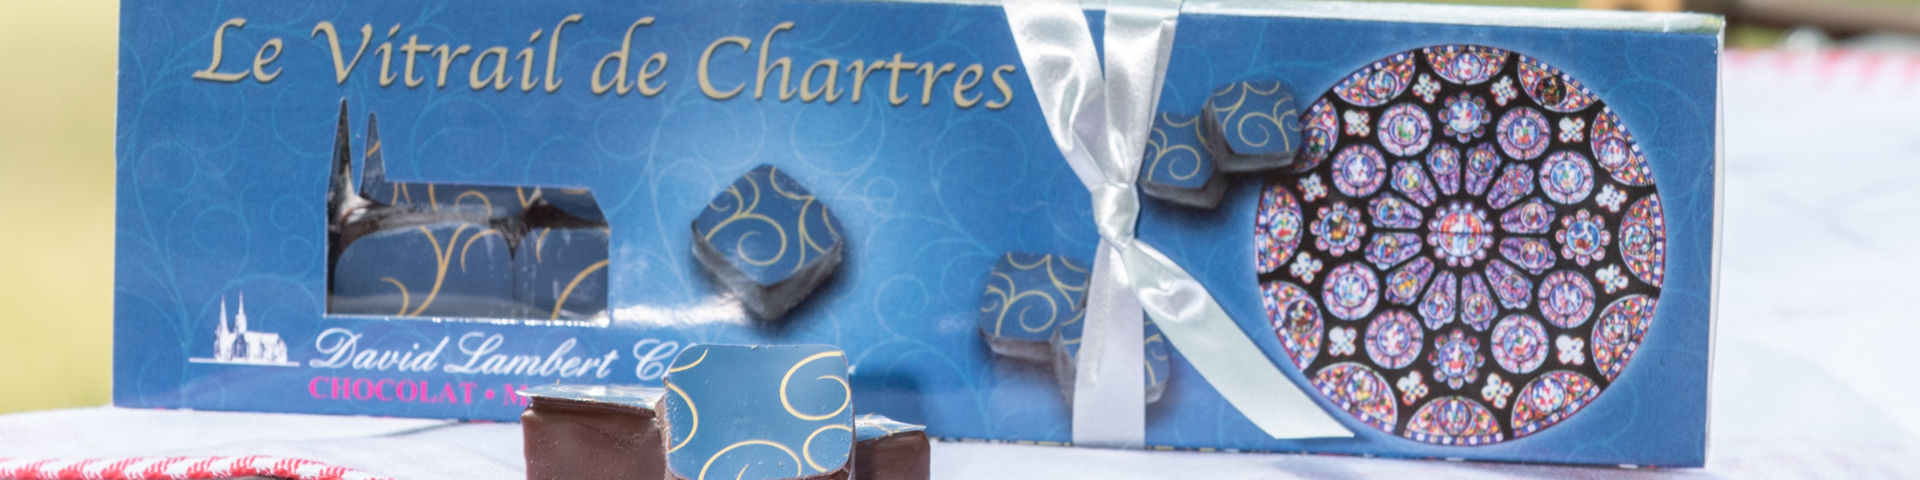 Vitrail de Chartres Chocolate